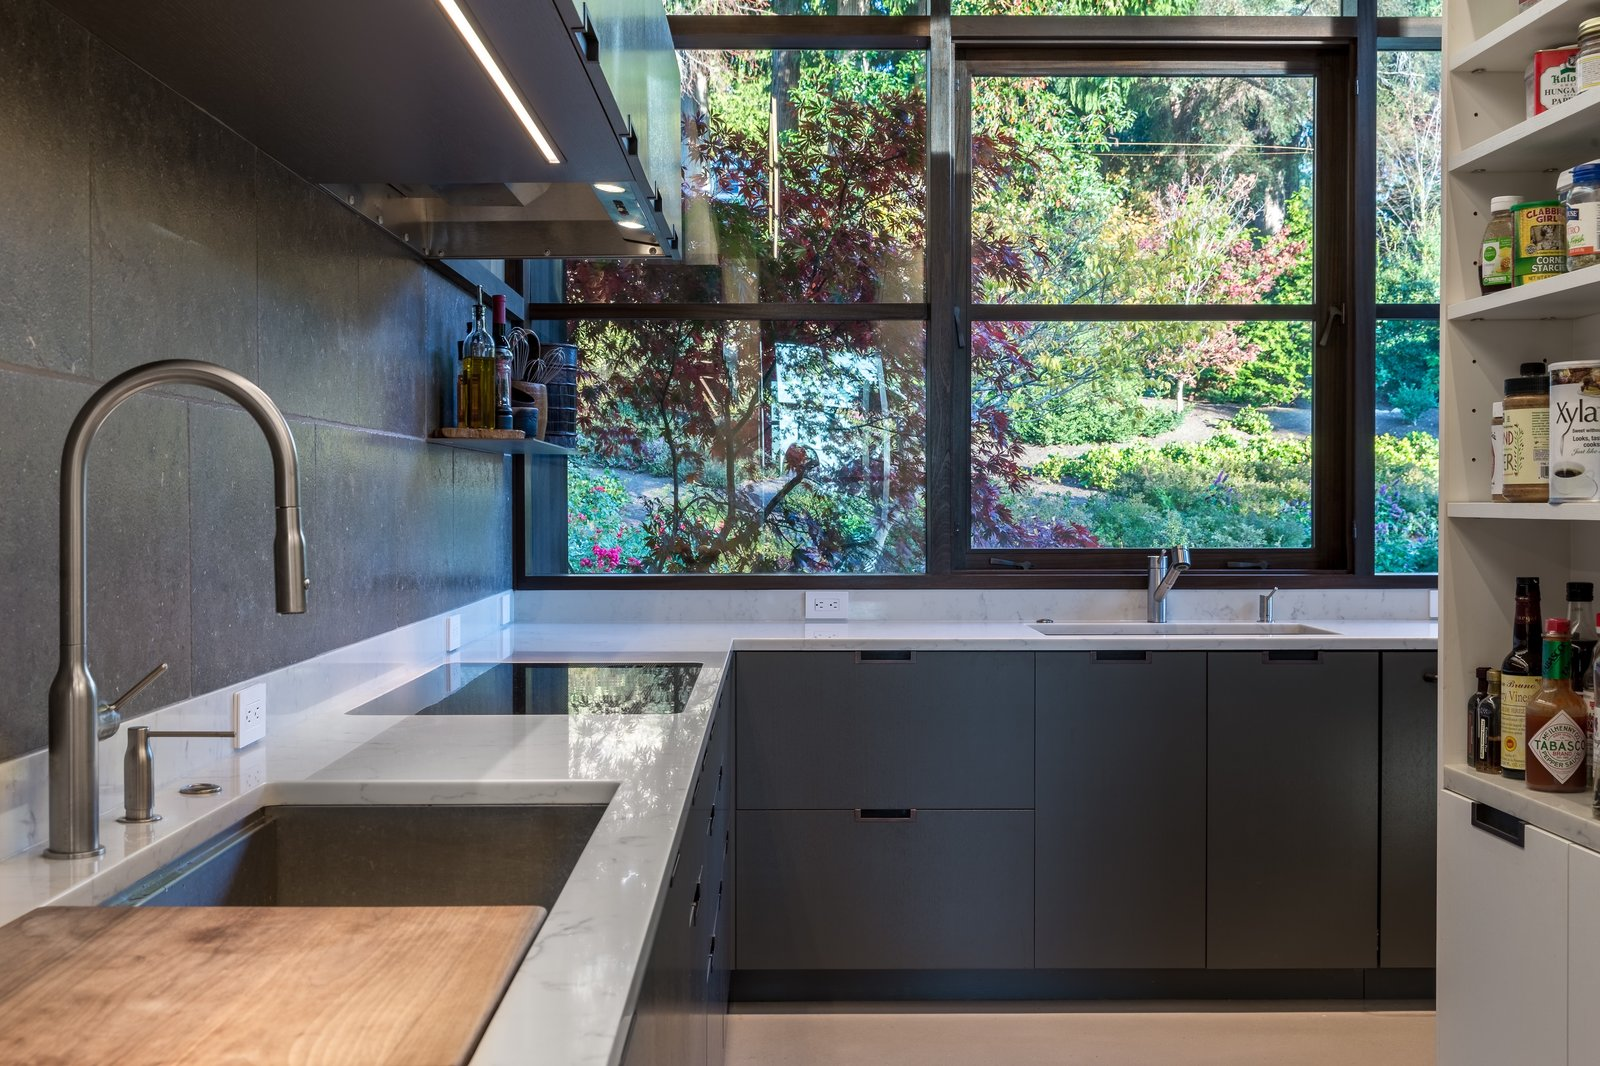 Kitchen, Quartzite, Range, Open, Stone Slab, Concrete, Metal, Drop In, and Recessed  Kitchen Concrete Metal Quartzite Photos from Kayak Point